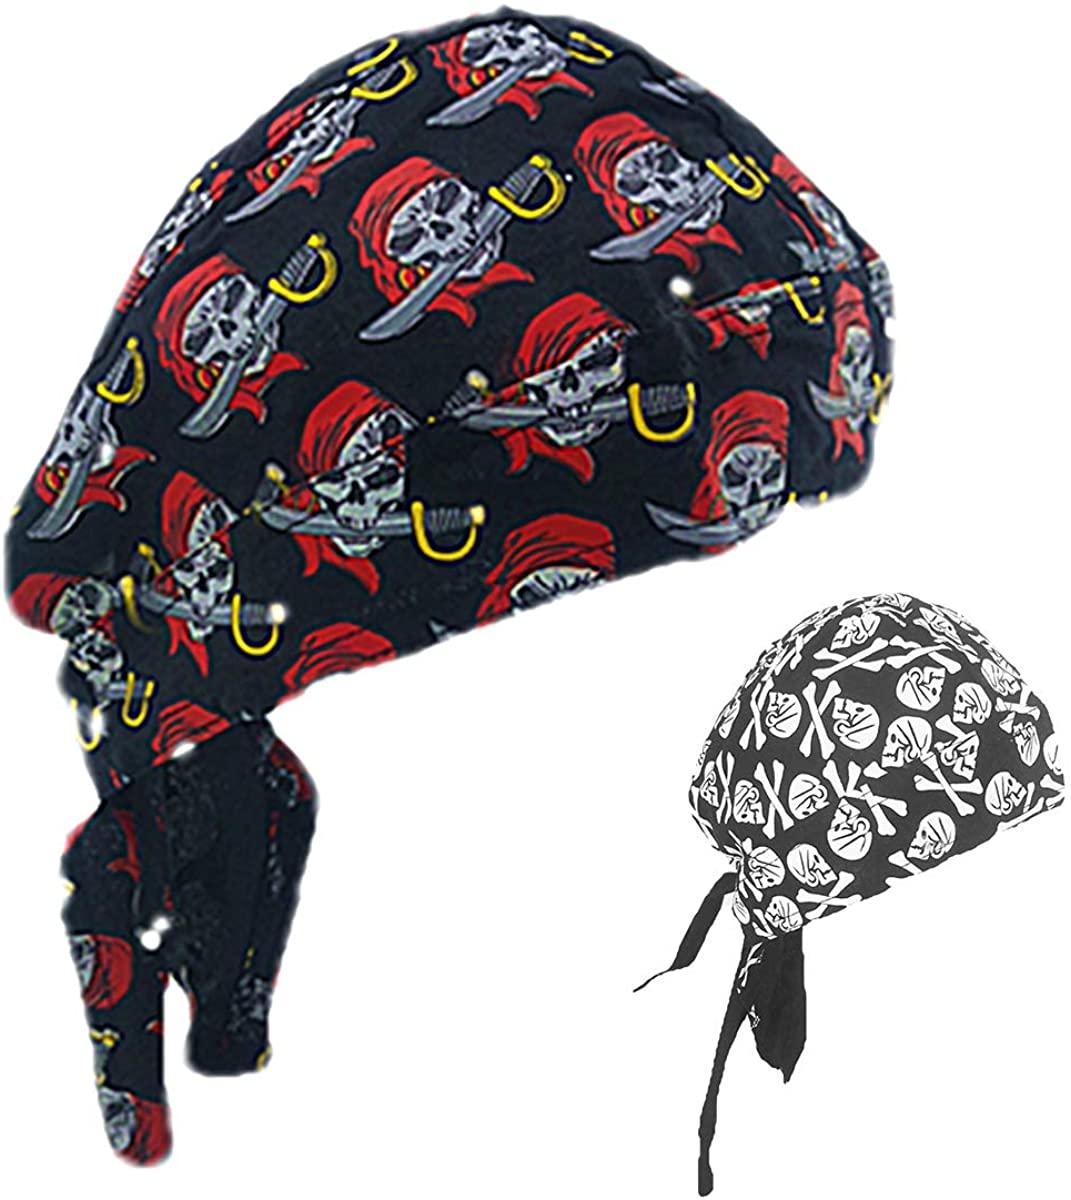 Skull Cap Head Bandana for Men Cotton Sweat Wicking